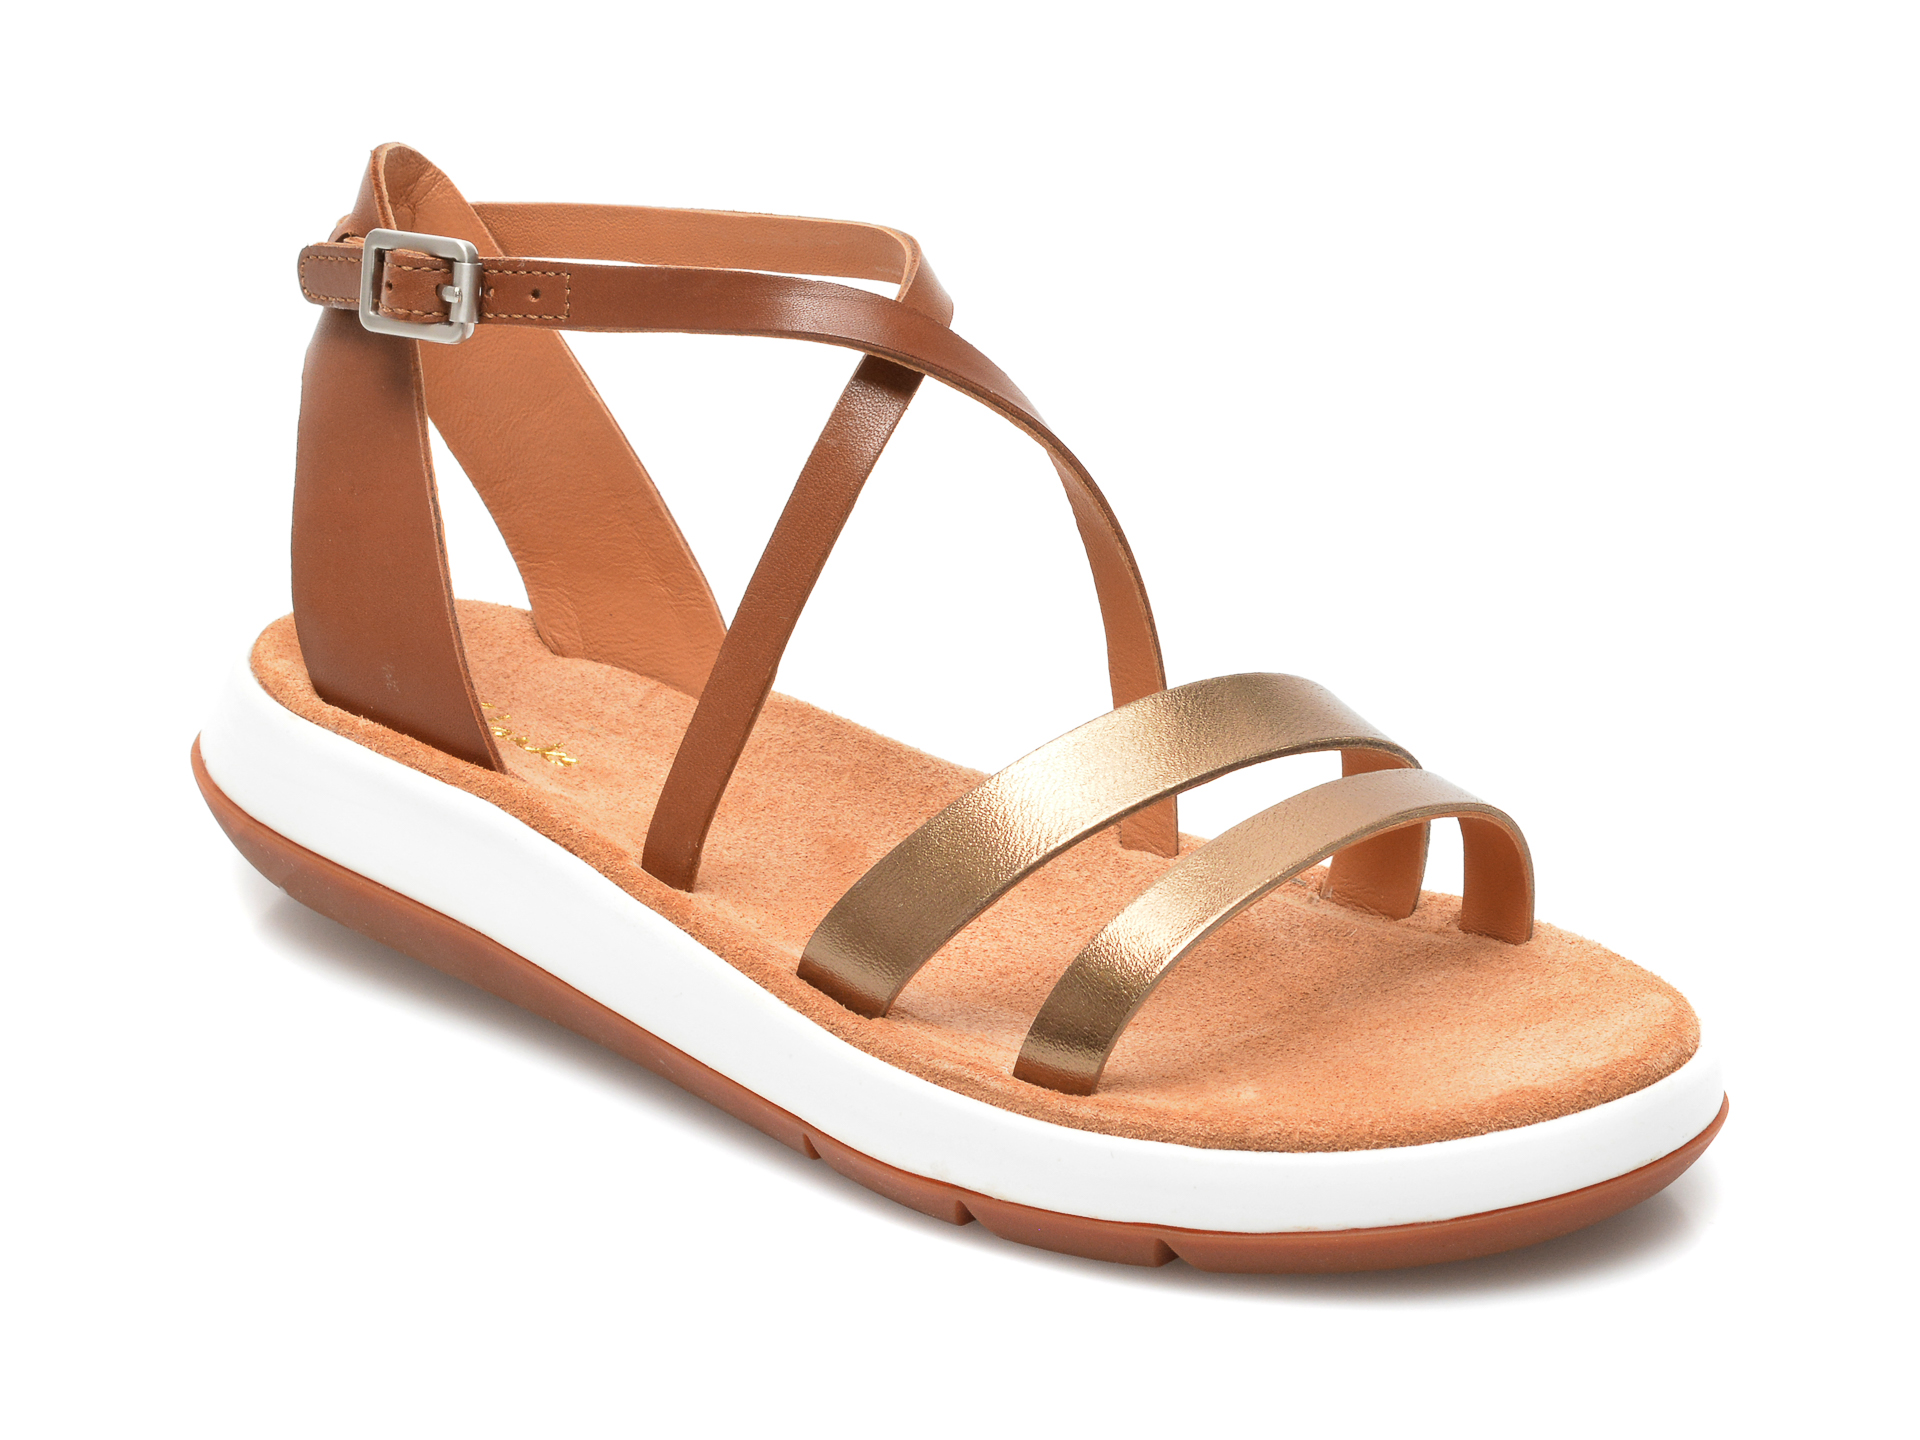 Sandale CLARKS aurii, Jemsa Strap, din piele naturala